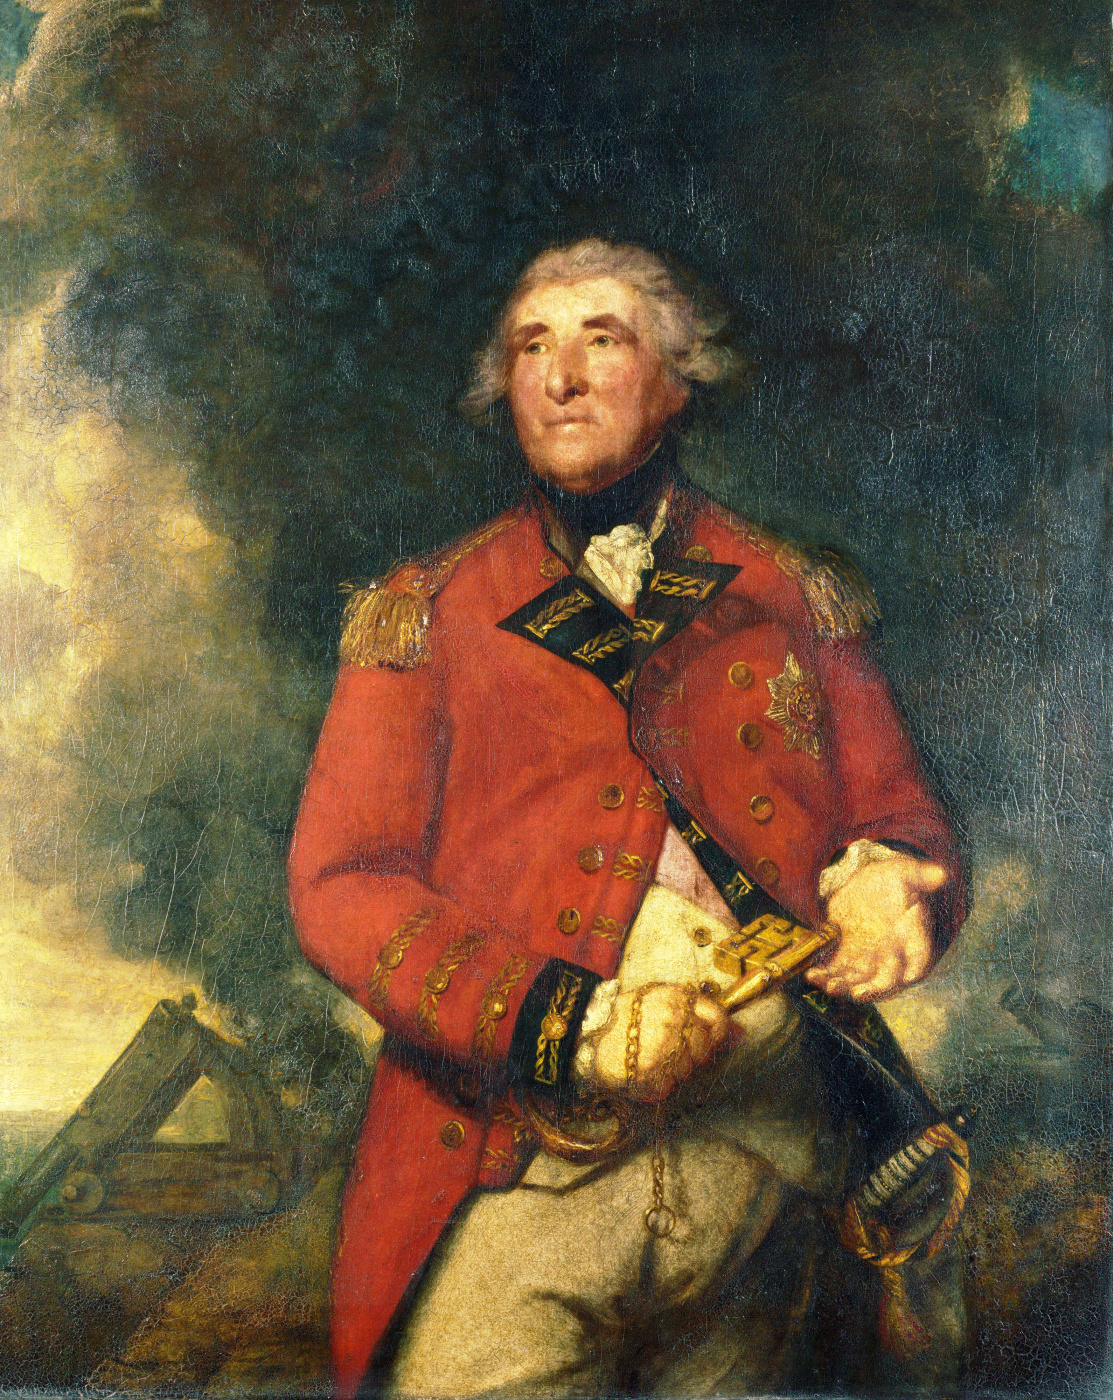 Joshua Reynolds. Portrait of Admiral Lord Heathfield, Governor of Gibraltar